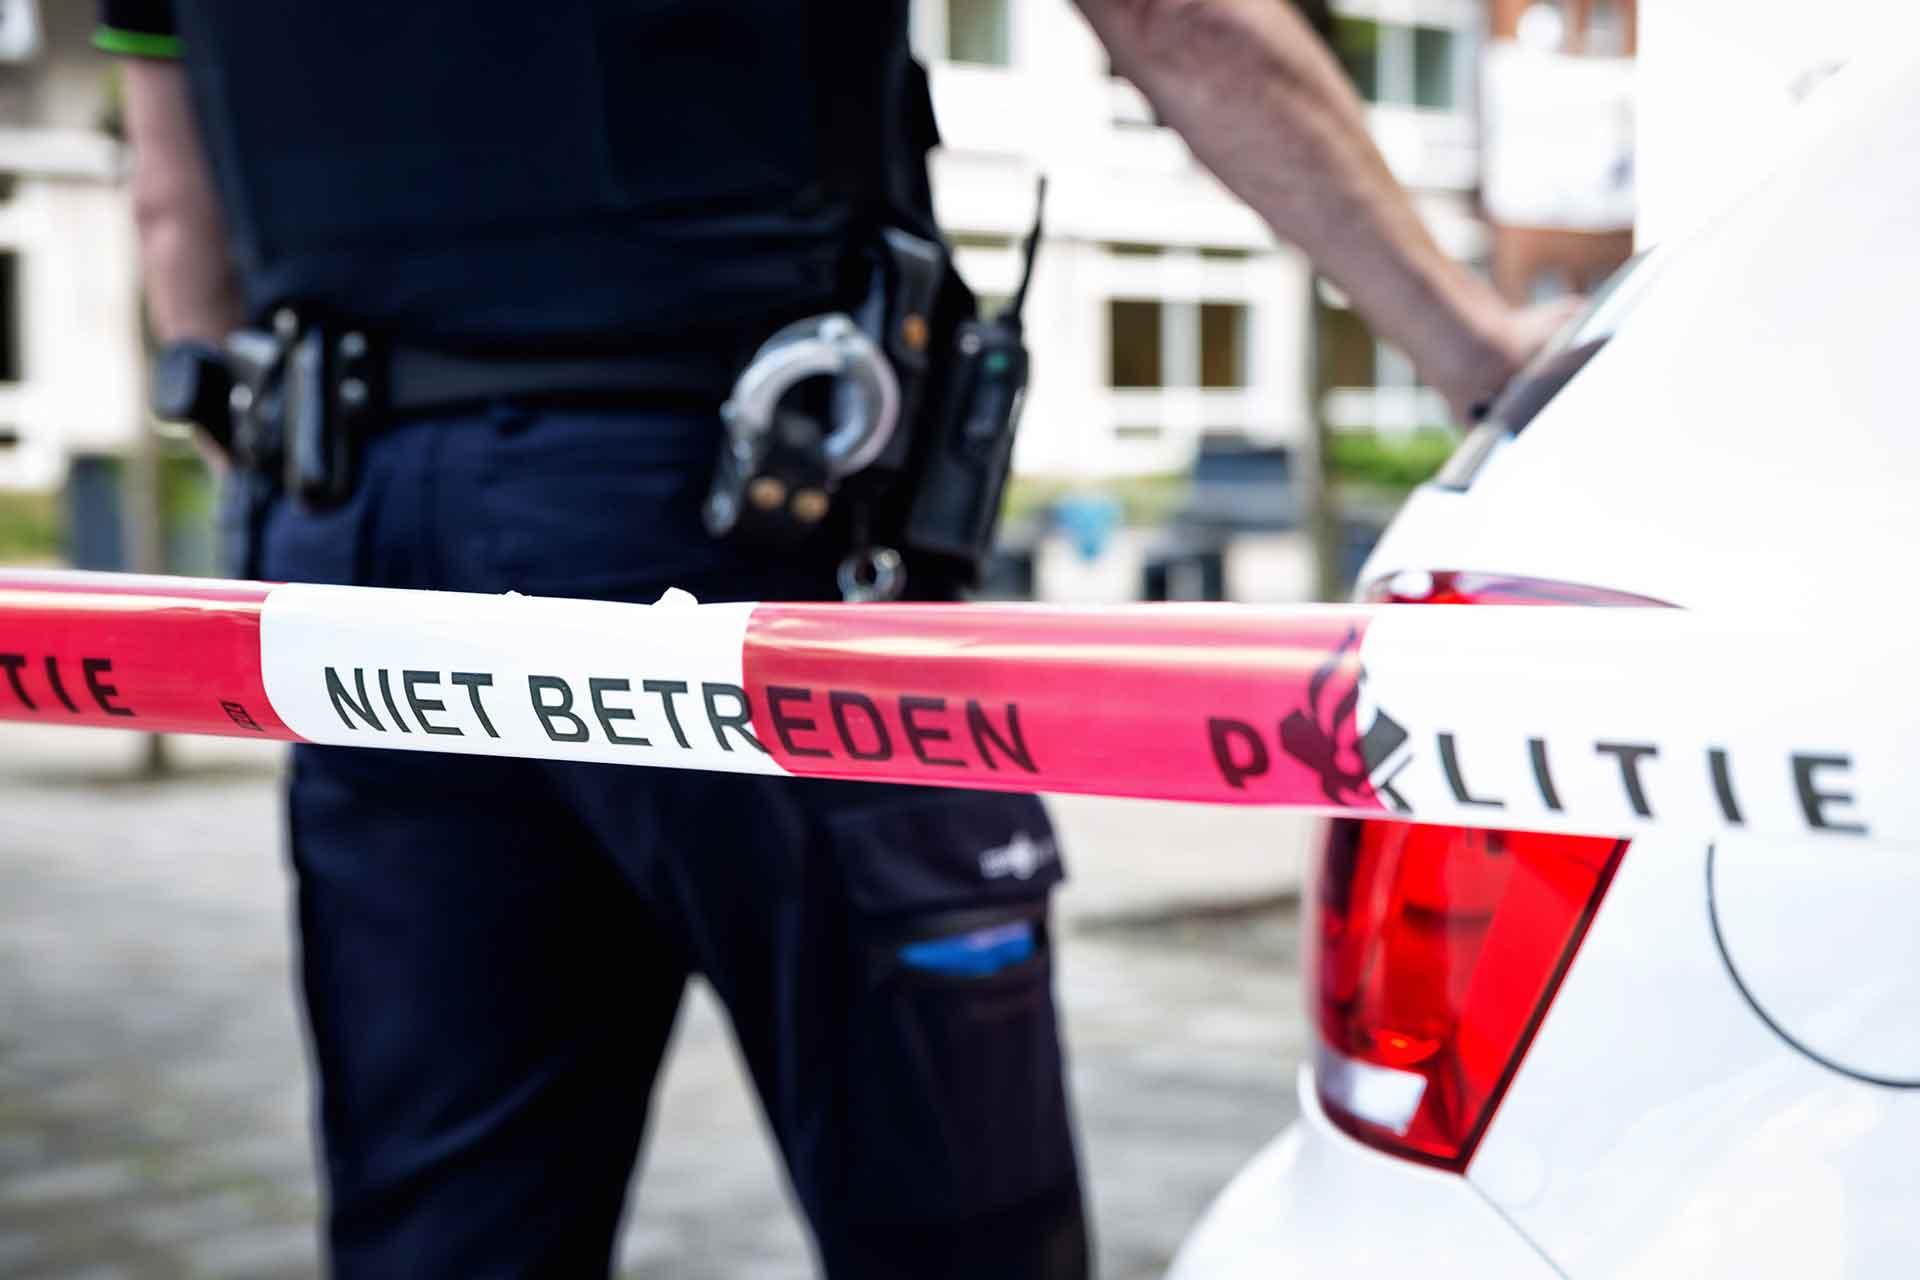 Spraakmakende strafzaken - Moord 9-jarige Yassin